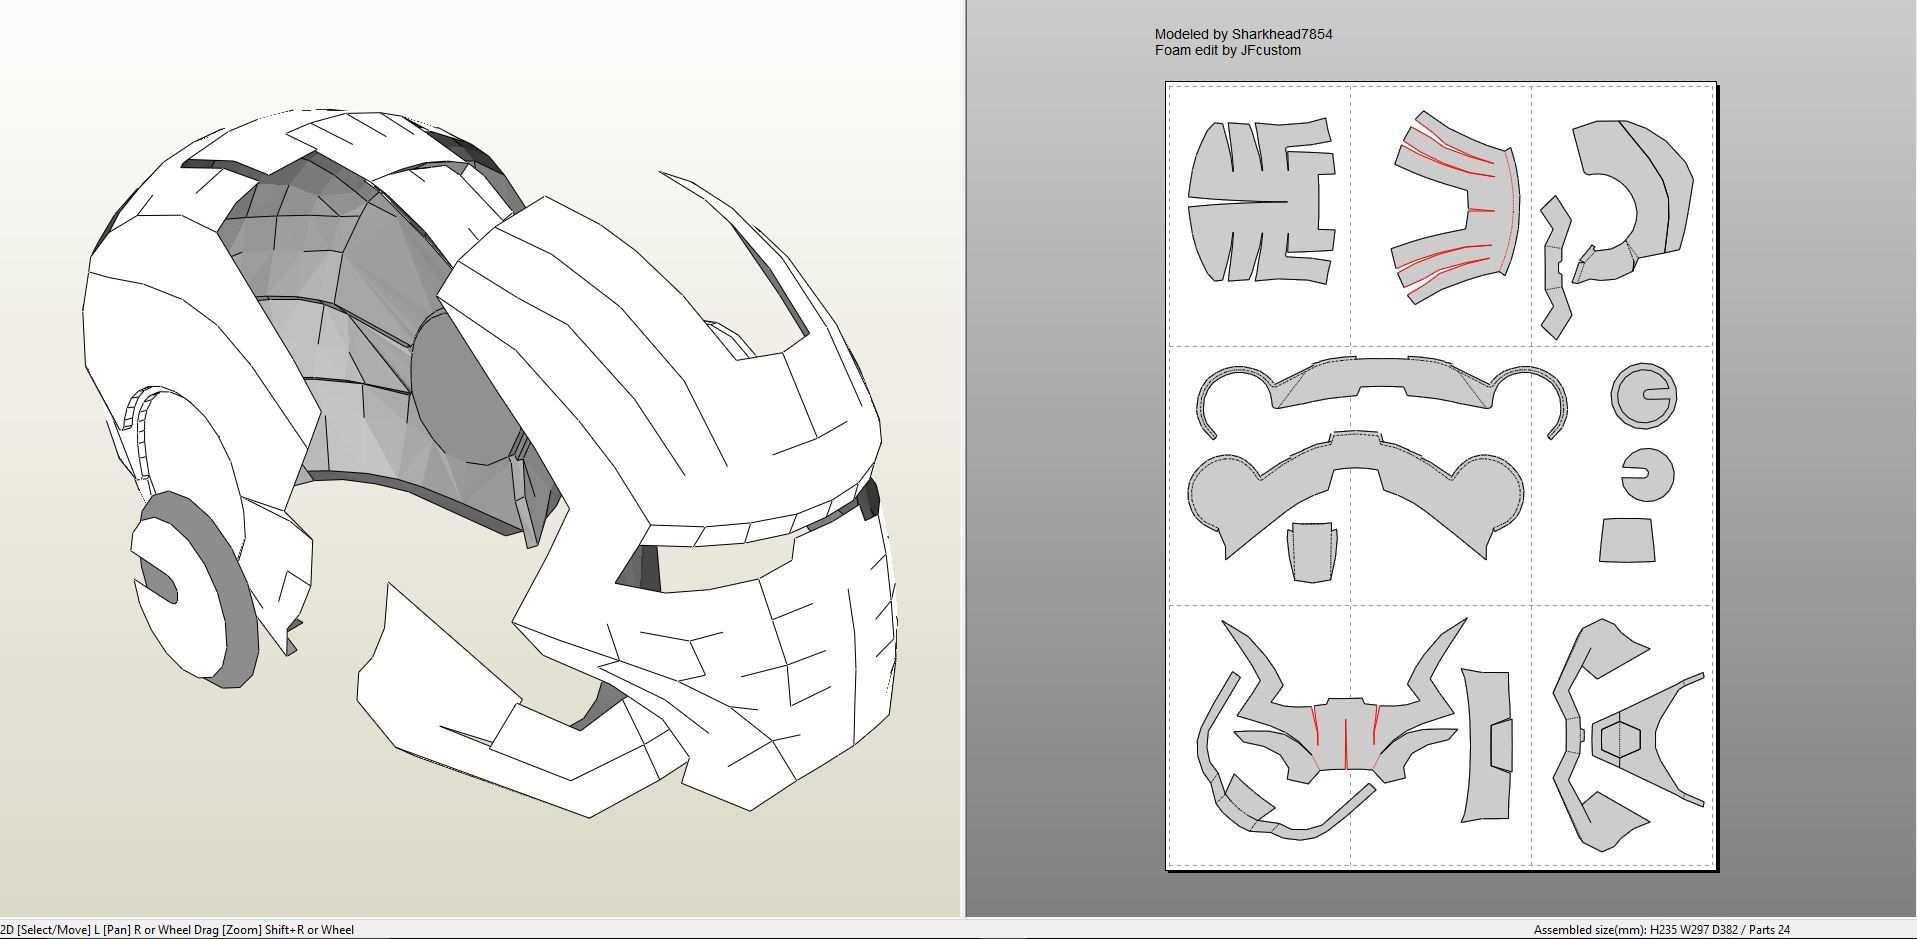 Papercraft Pdo File Template For Iron Man Mark 2 Full Armor Foam Iron Man Helmet Iron Man Mark 2 Pepakura Iron Man